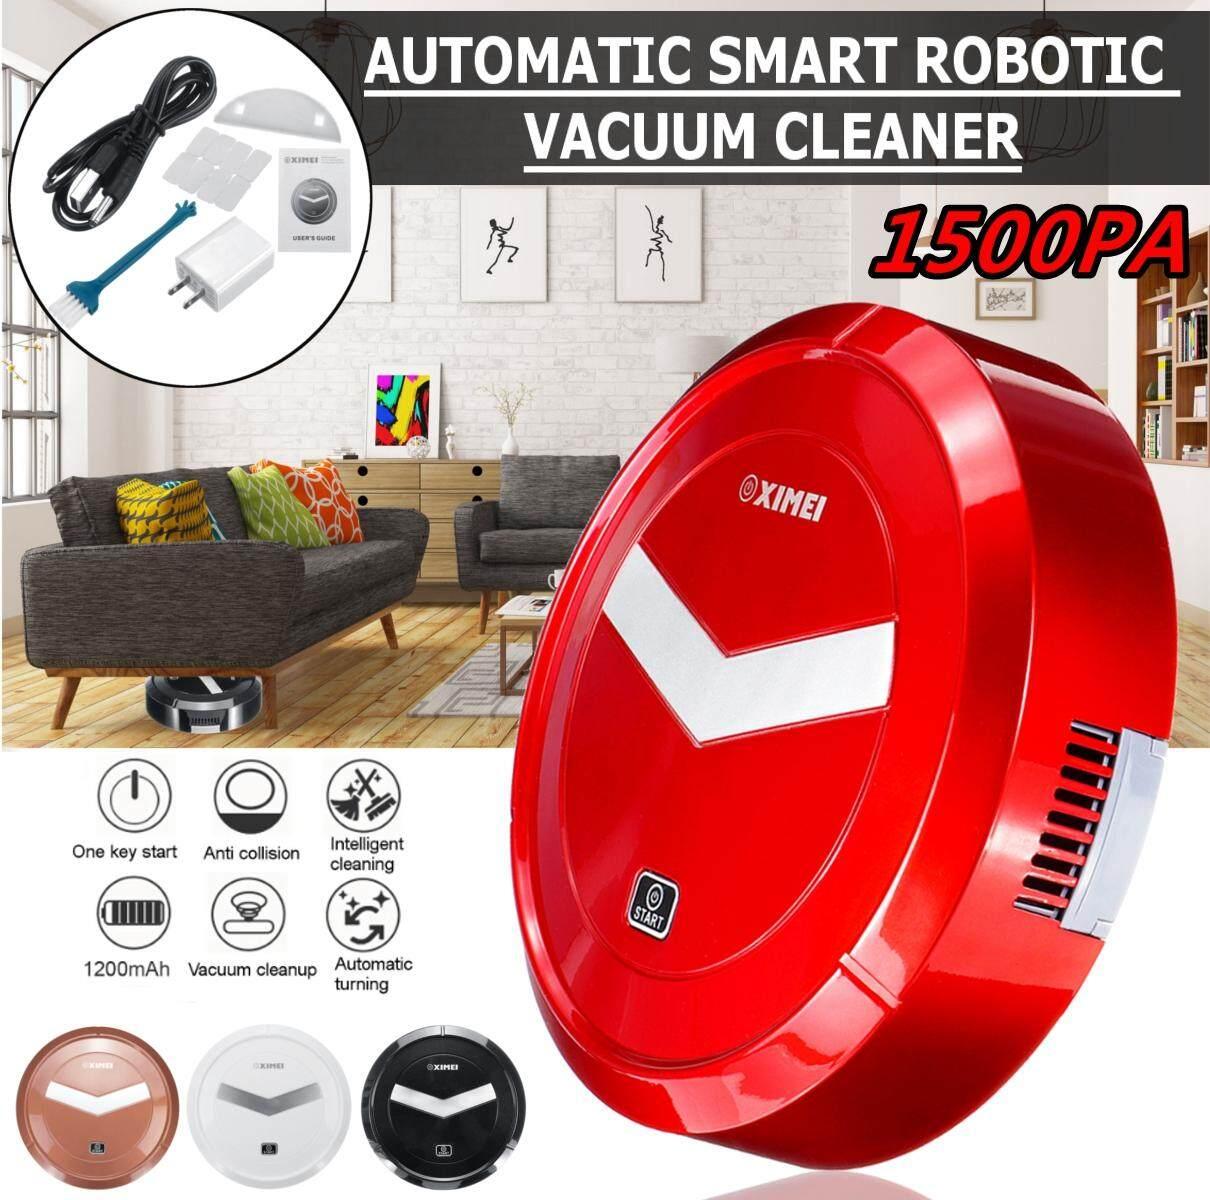 【free Pengiriman + Flash Deal】automatic Smart Robot Penghisap Debu Isi Ulang Hisap Kuat Menghindari Tabrakan By Elec Mall.